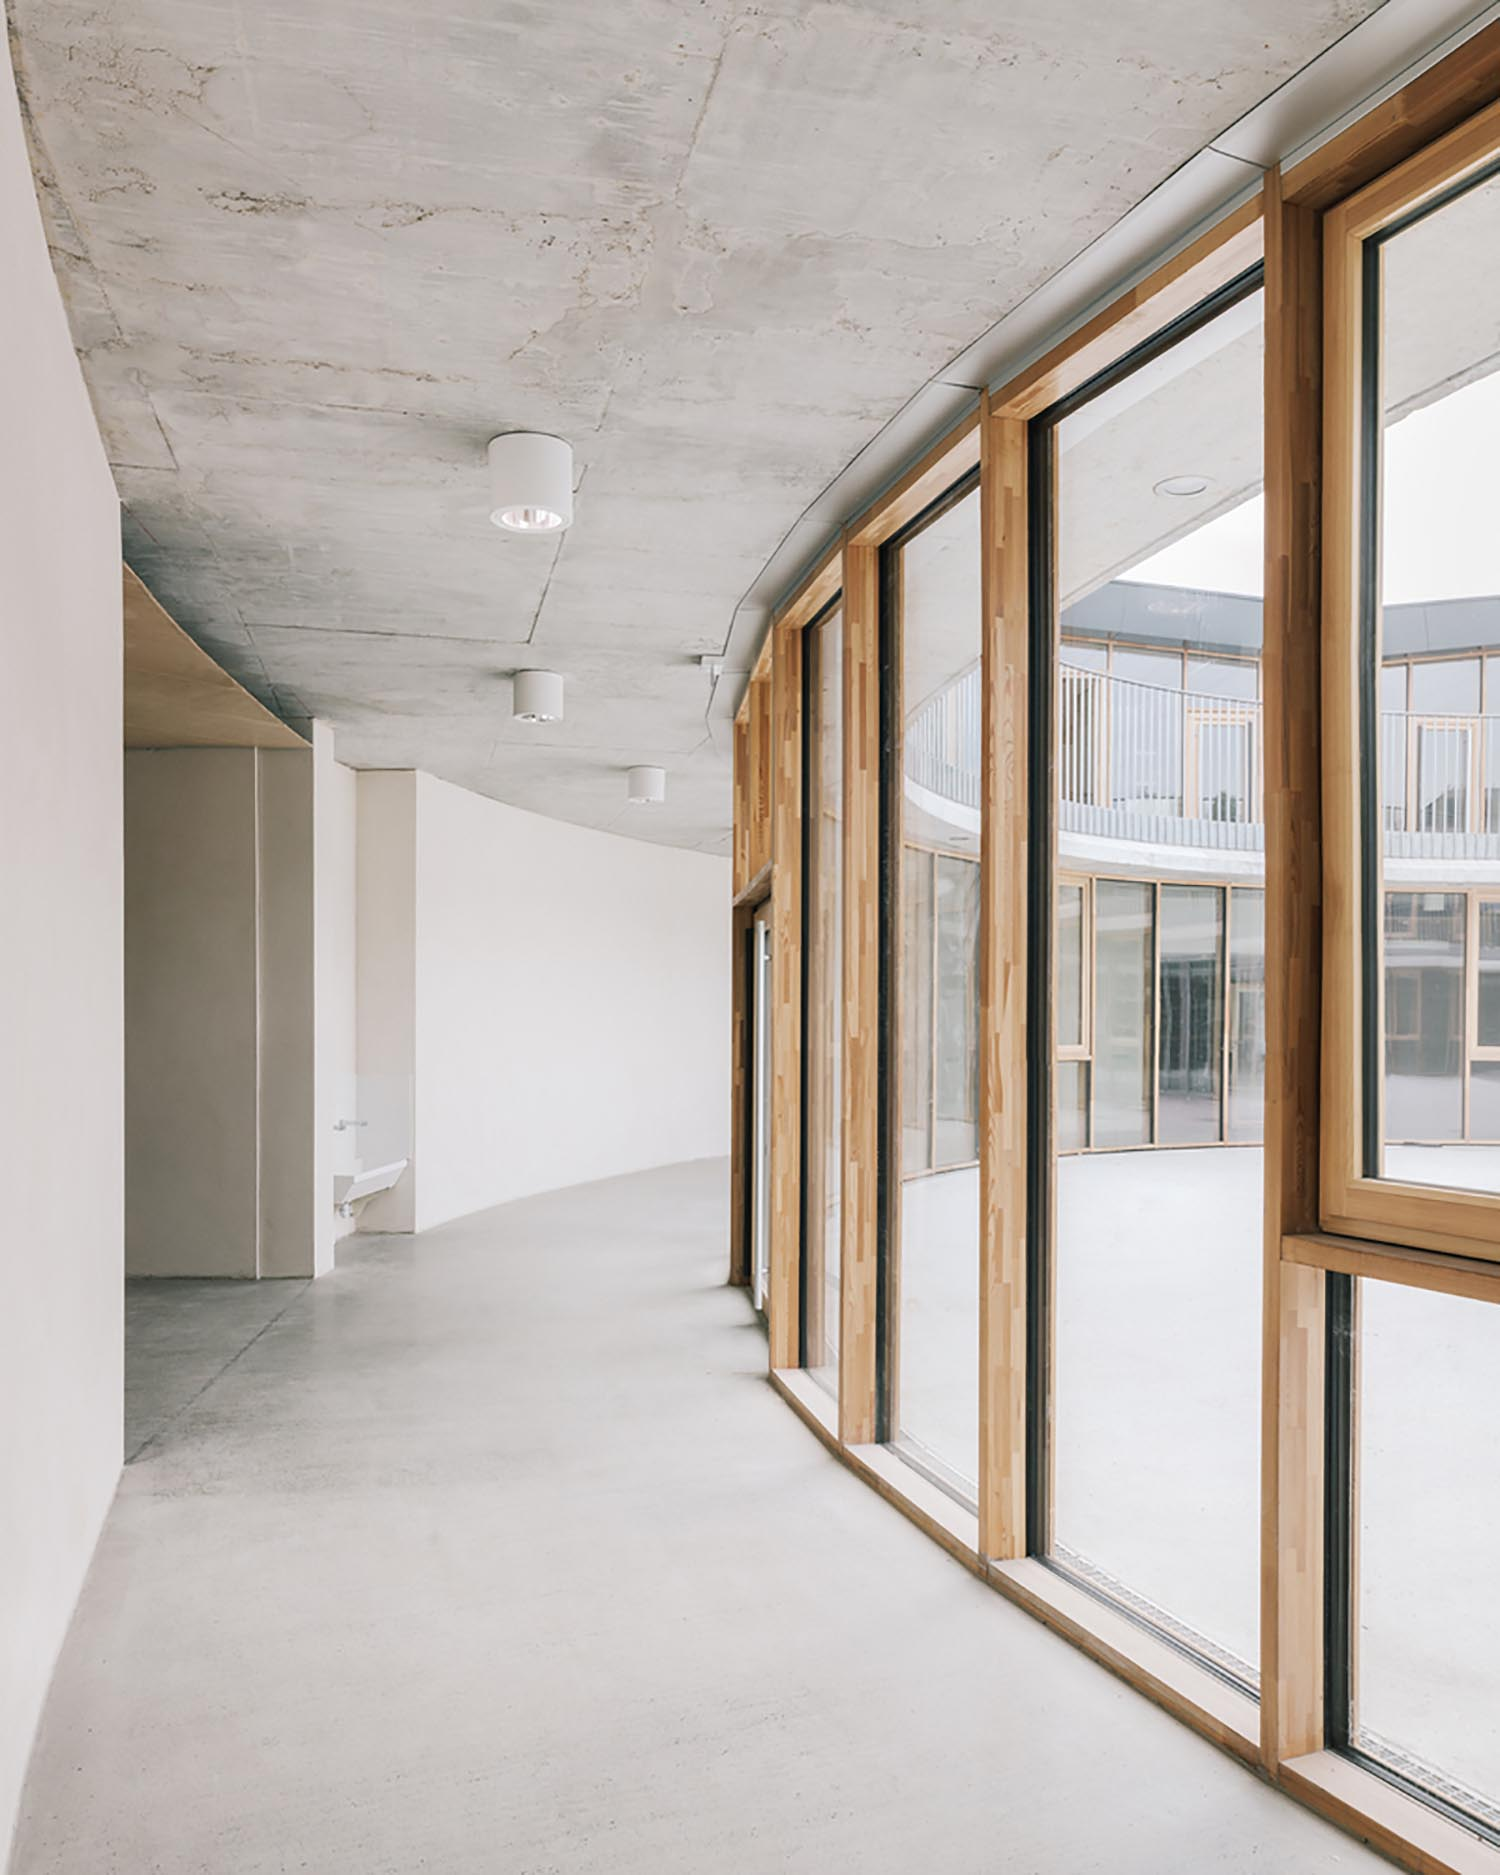 07_-_SAM_Architecture_-_Groupe_Scolaire_Rostand_-_Lille.jpg